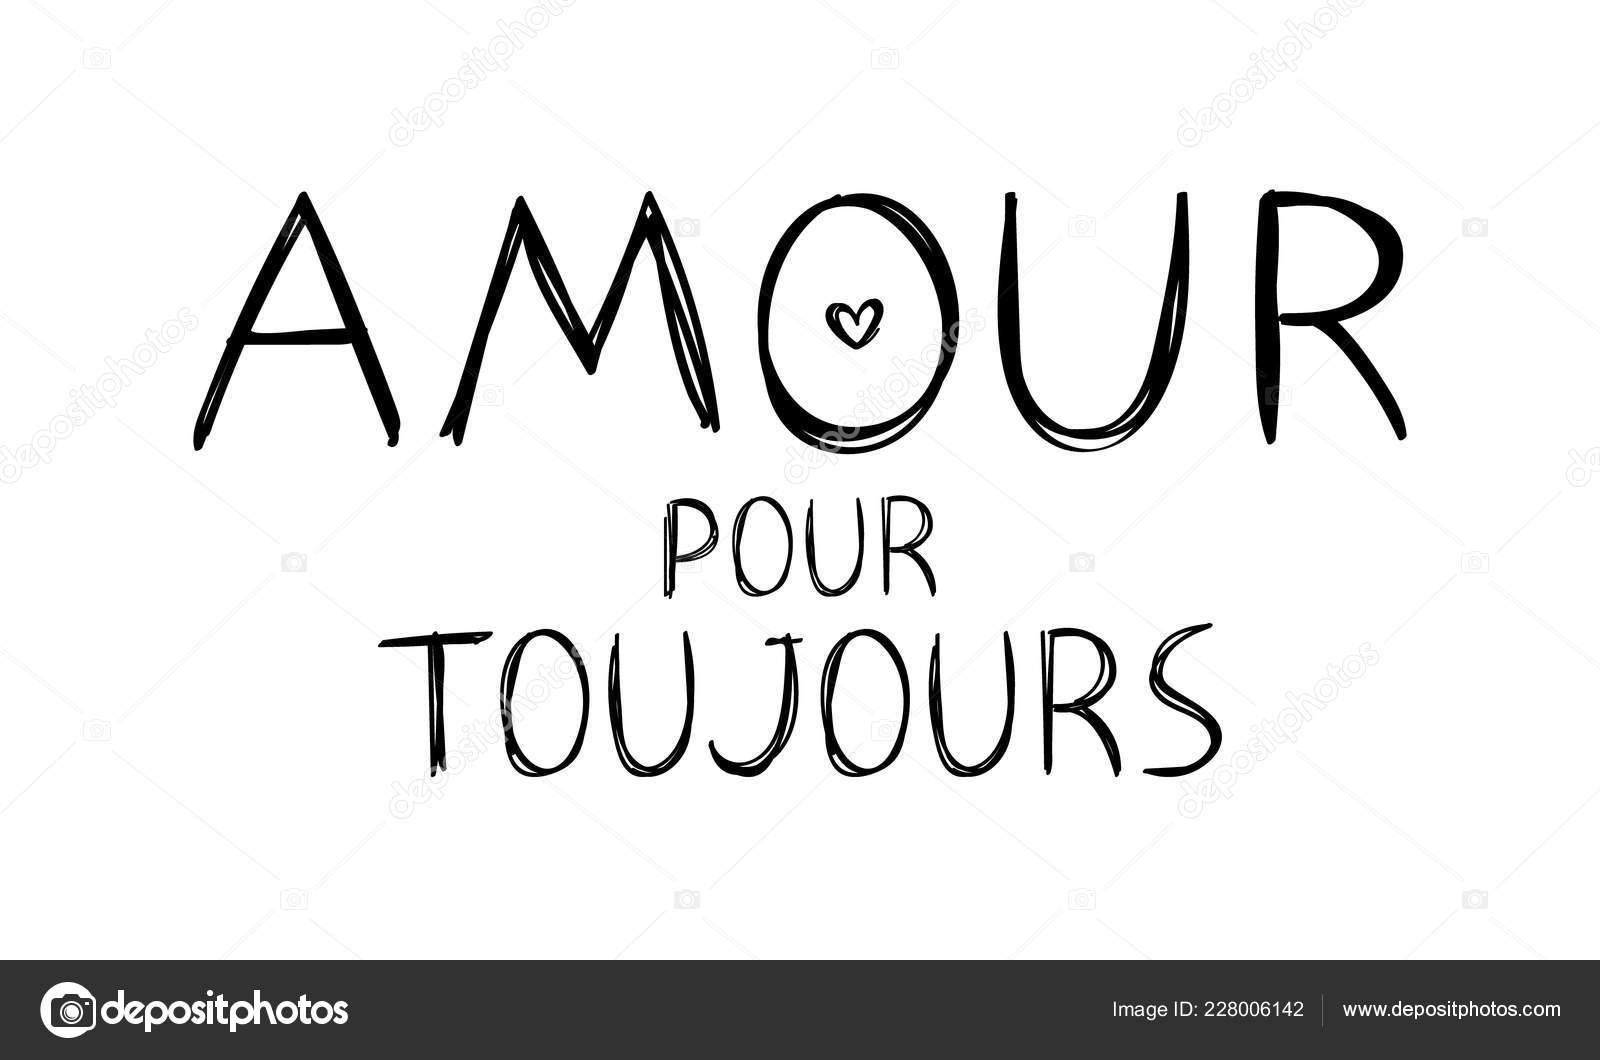 Amour Pour Toujours Love Forever Wiadomość W Francuski Na